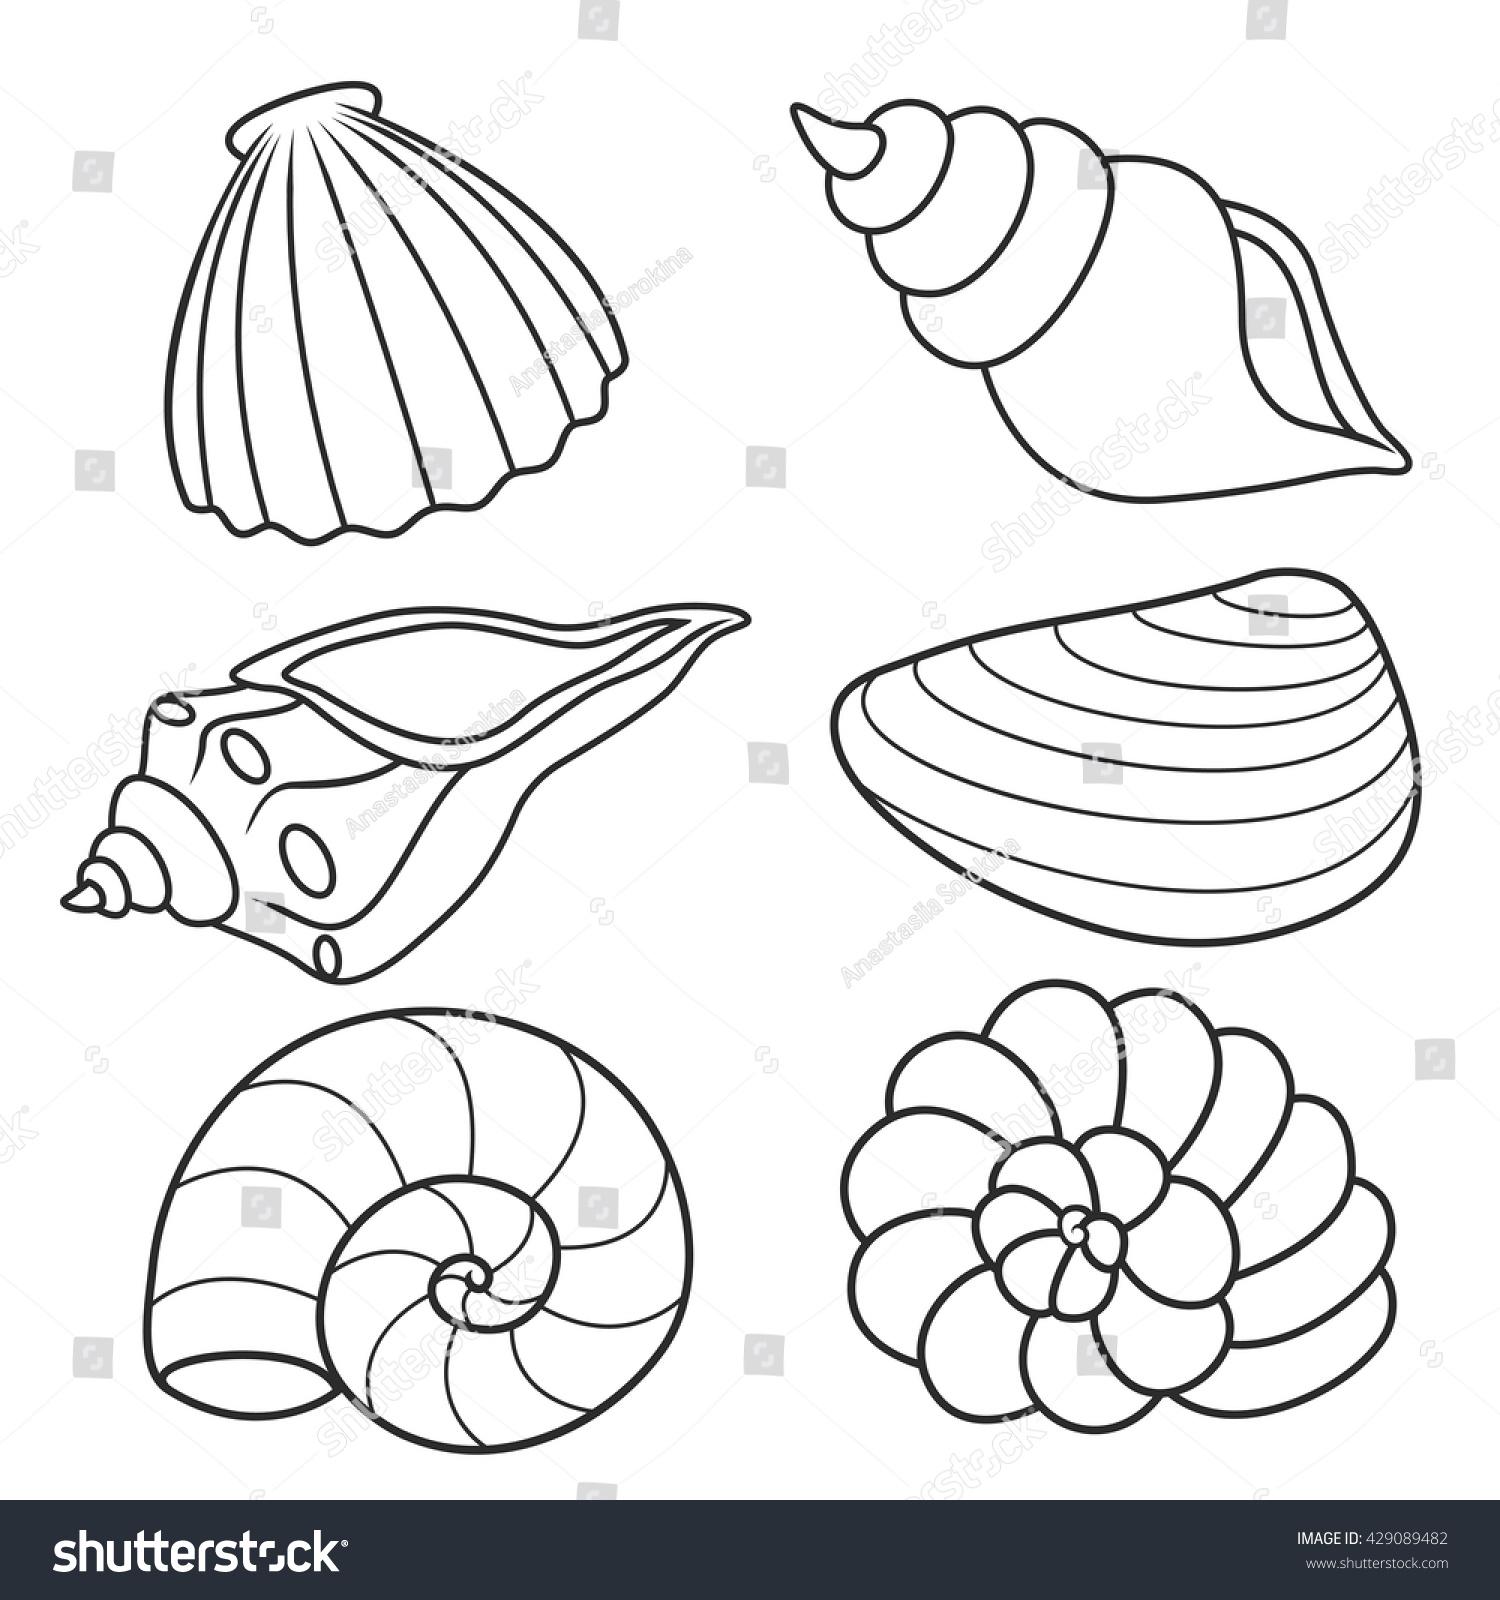 Seashells Coloring Bookset Stock Vector 429089482 ...